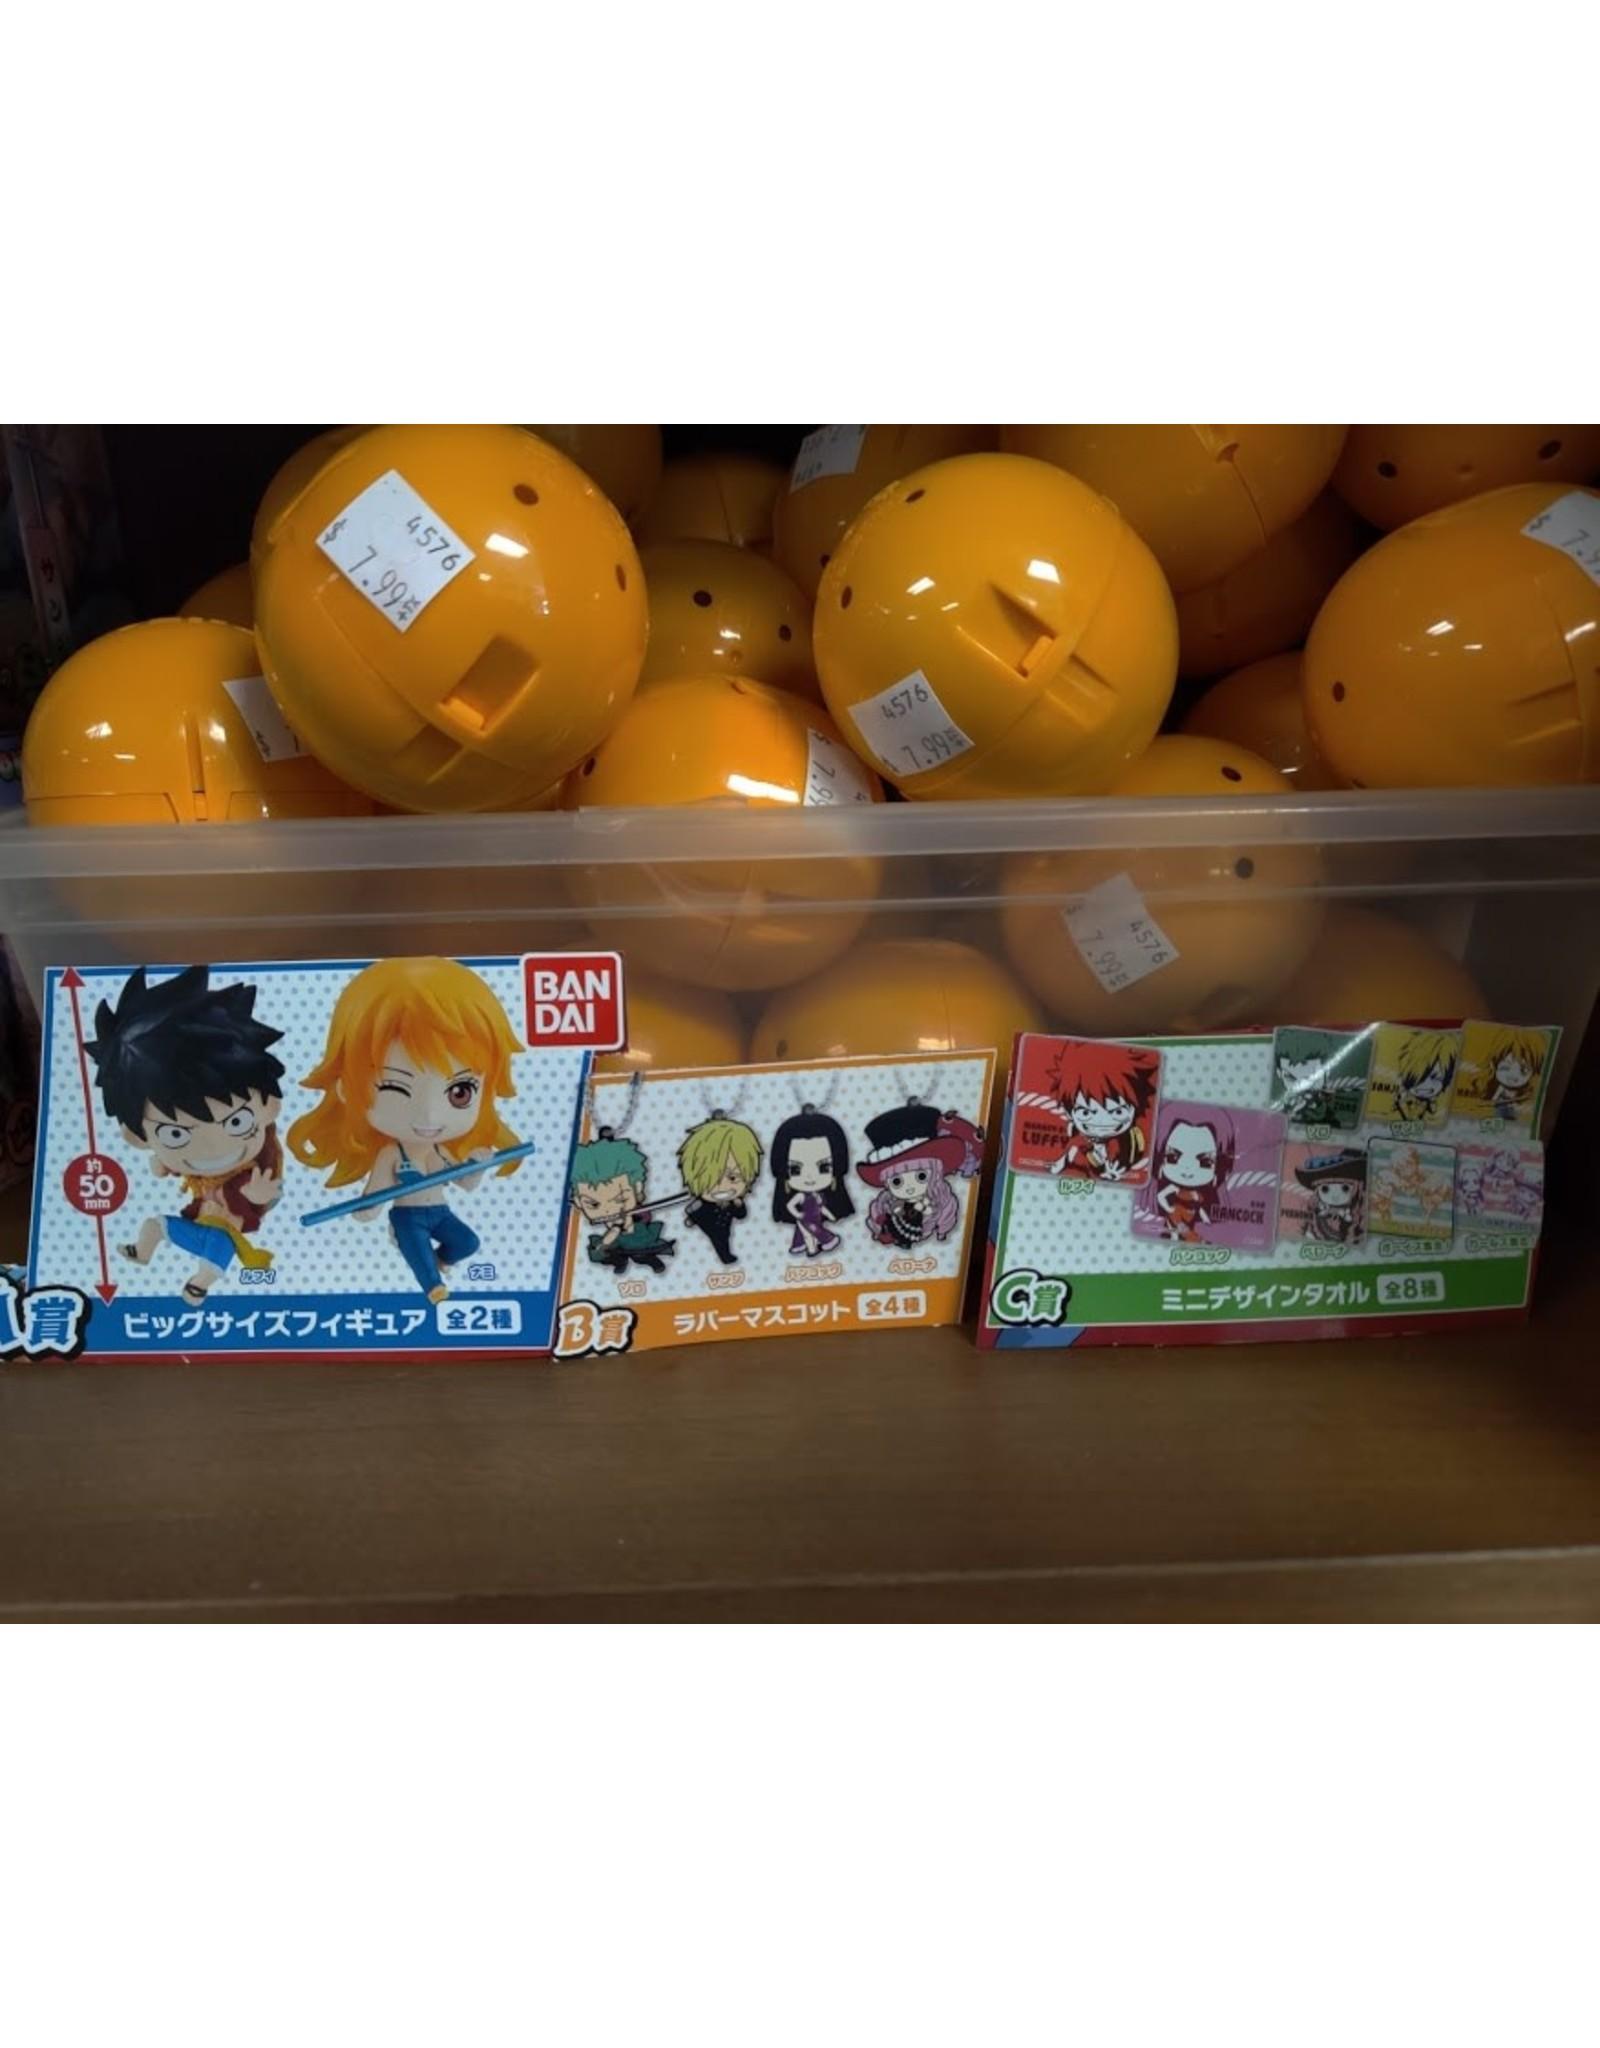 One Piece Towel/Strap/Figure Gachapon